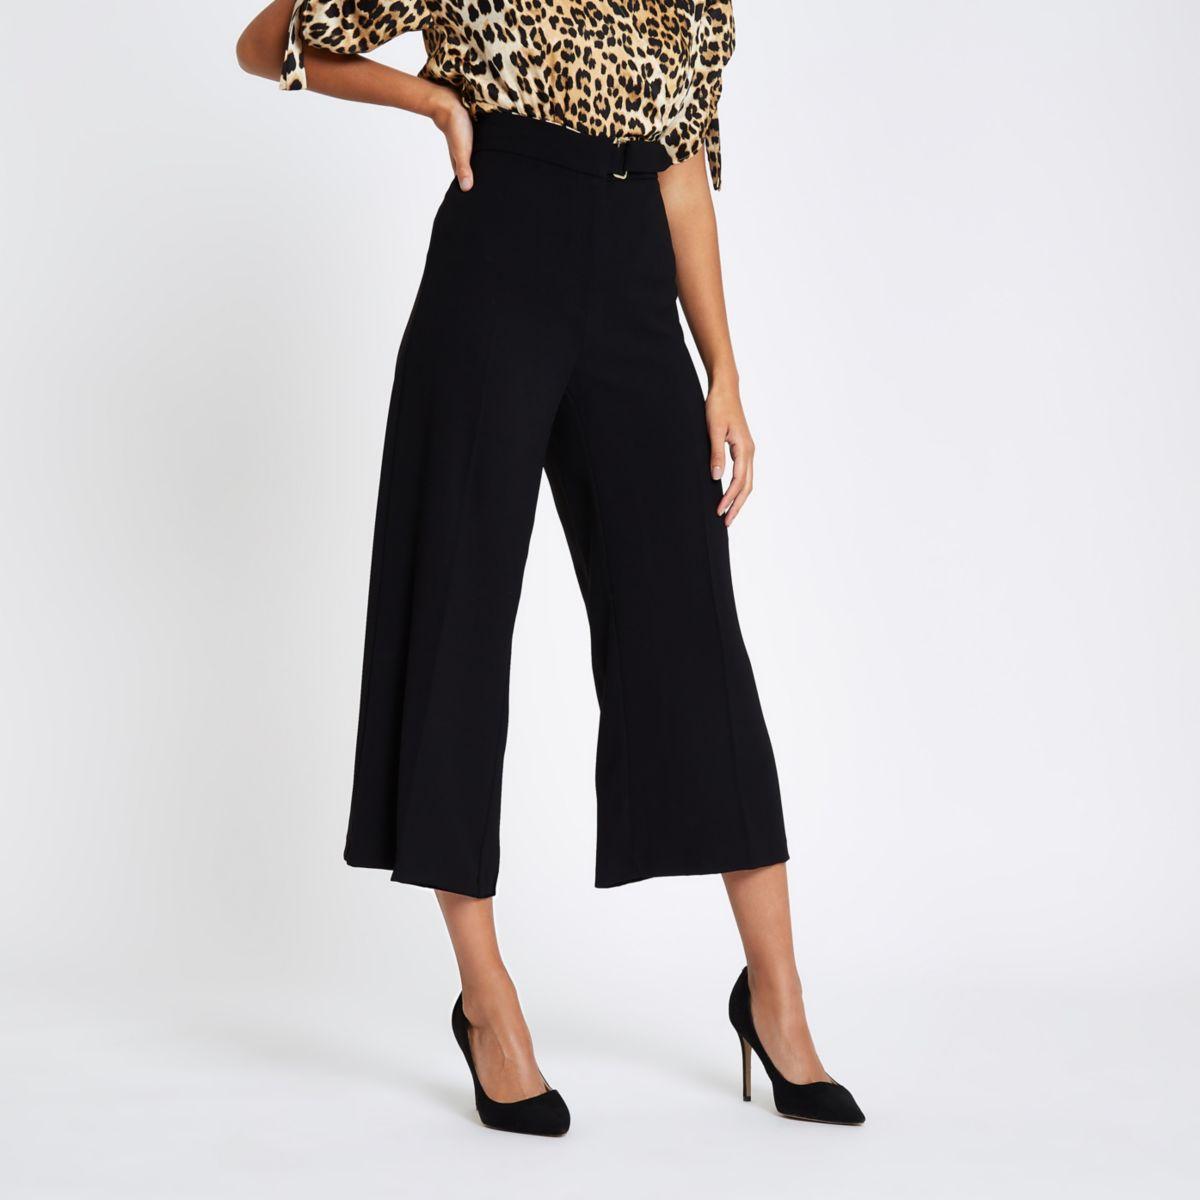 Black D ring waist culottes